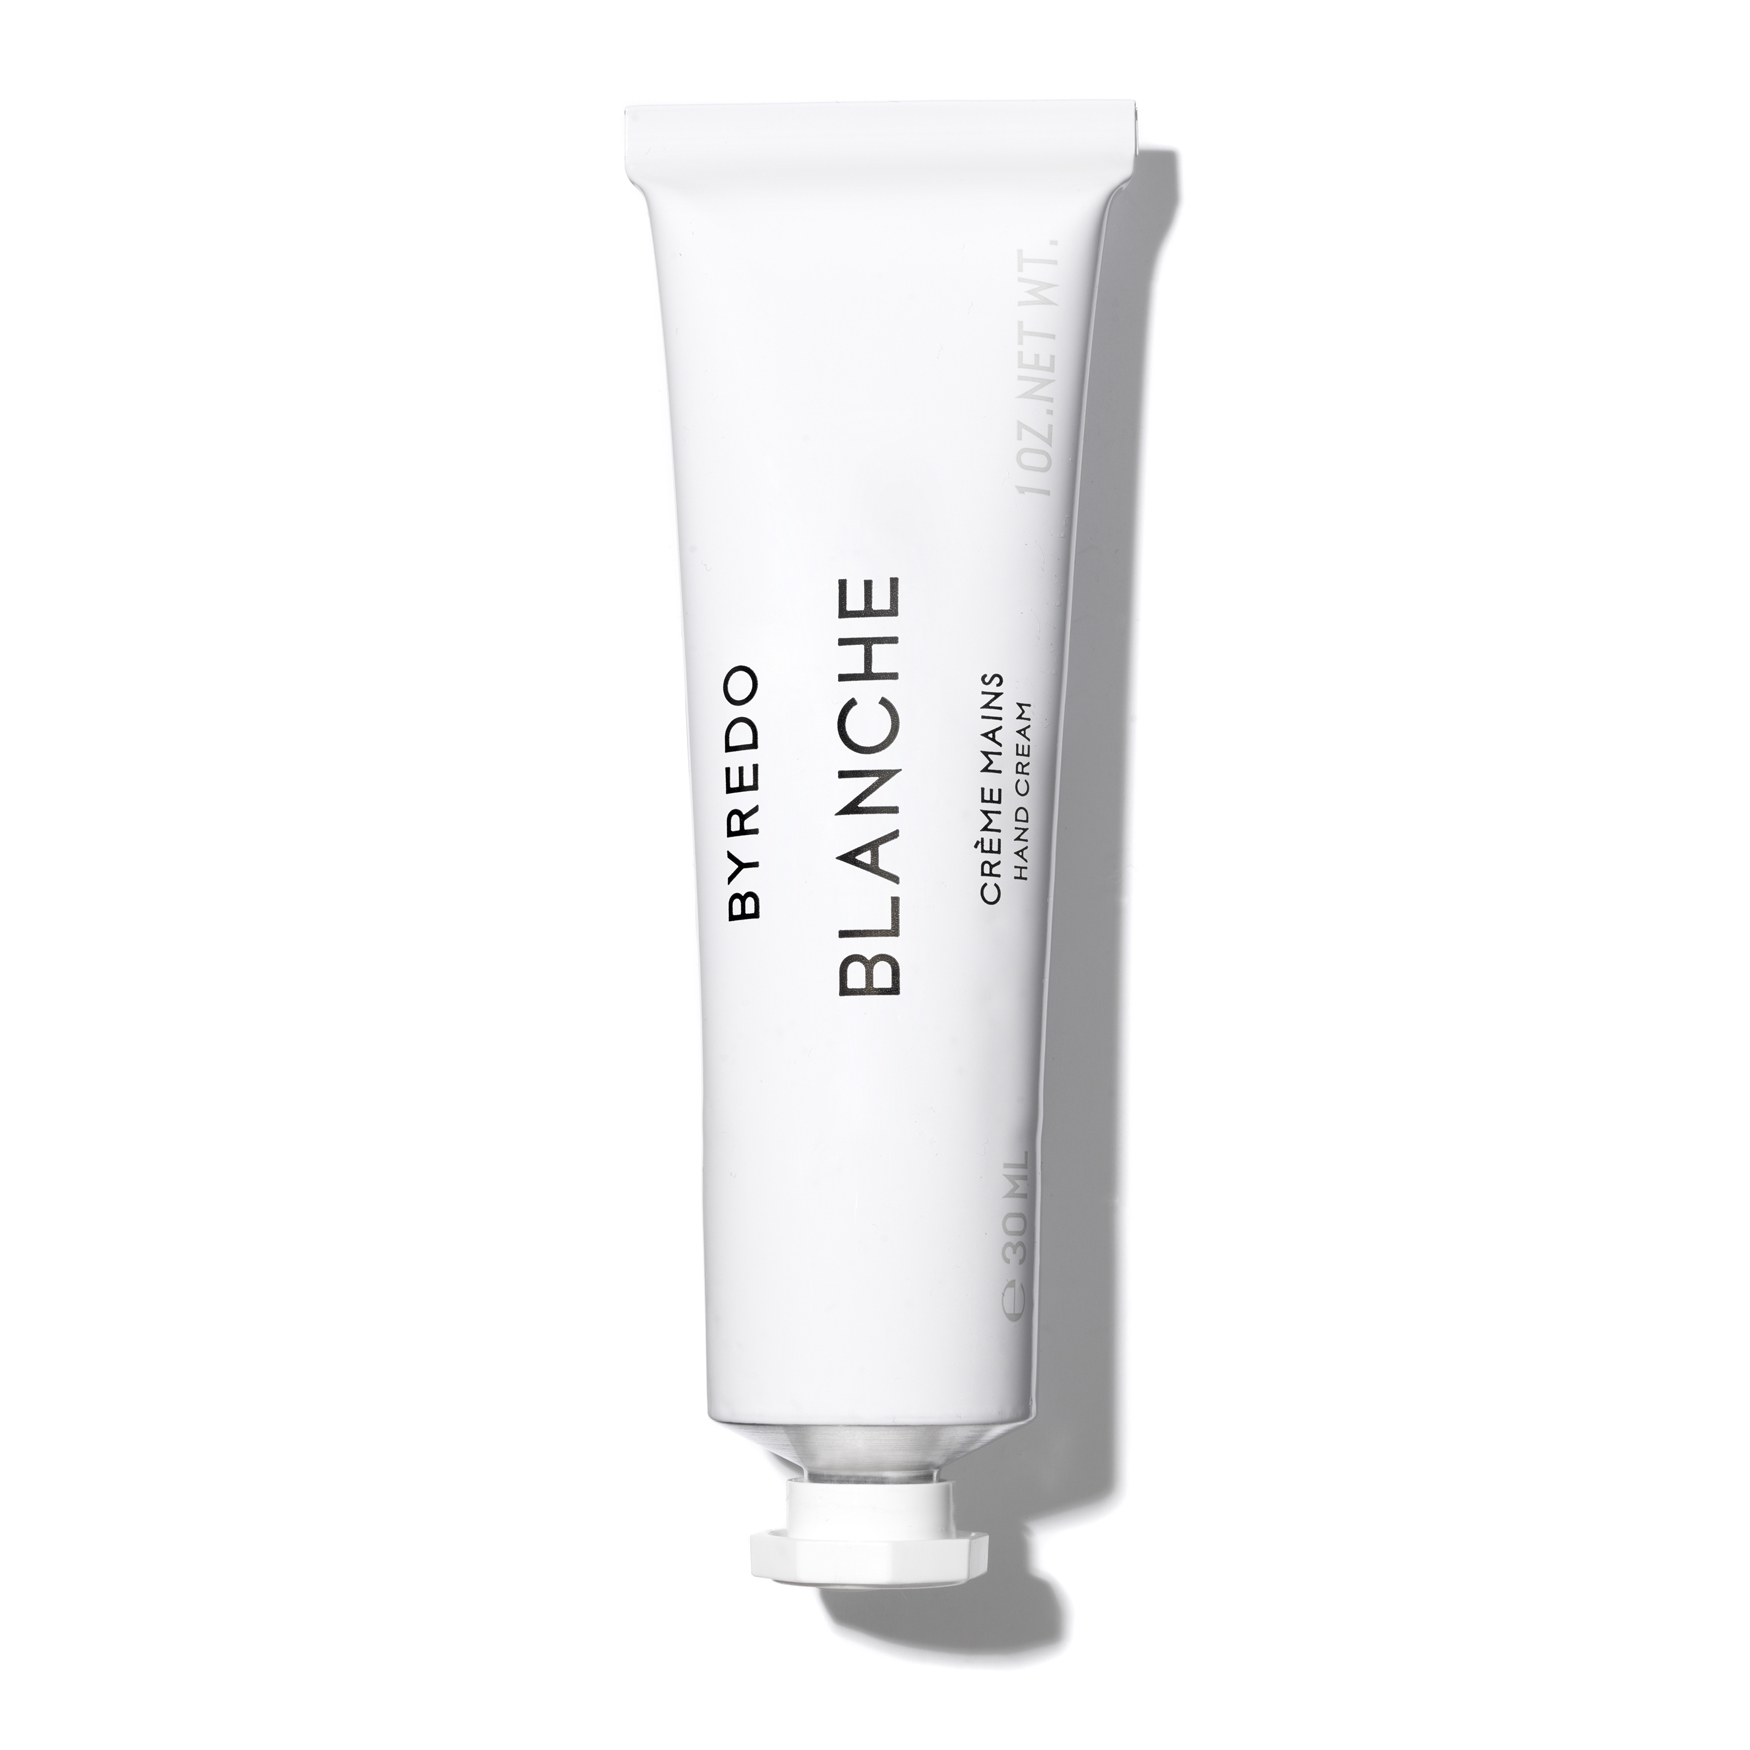 Blanche Hand Cream, , large